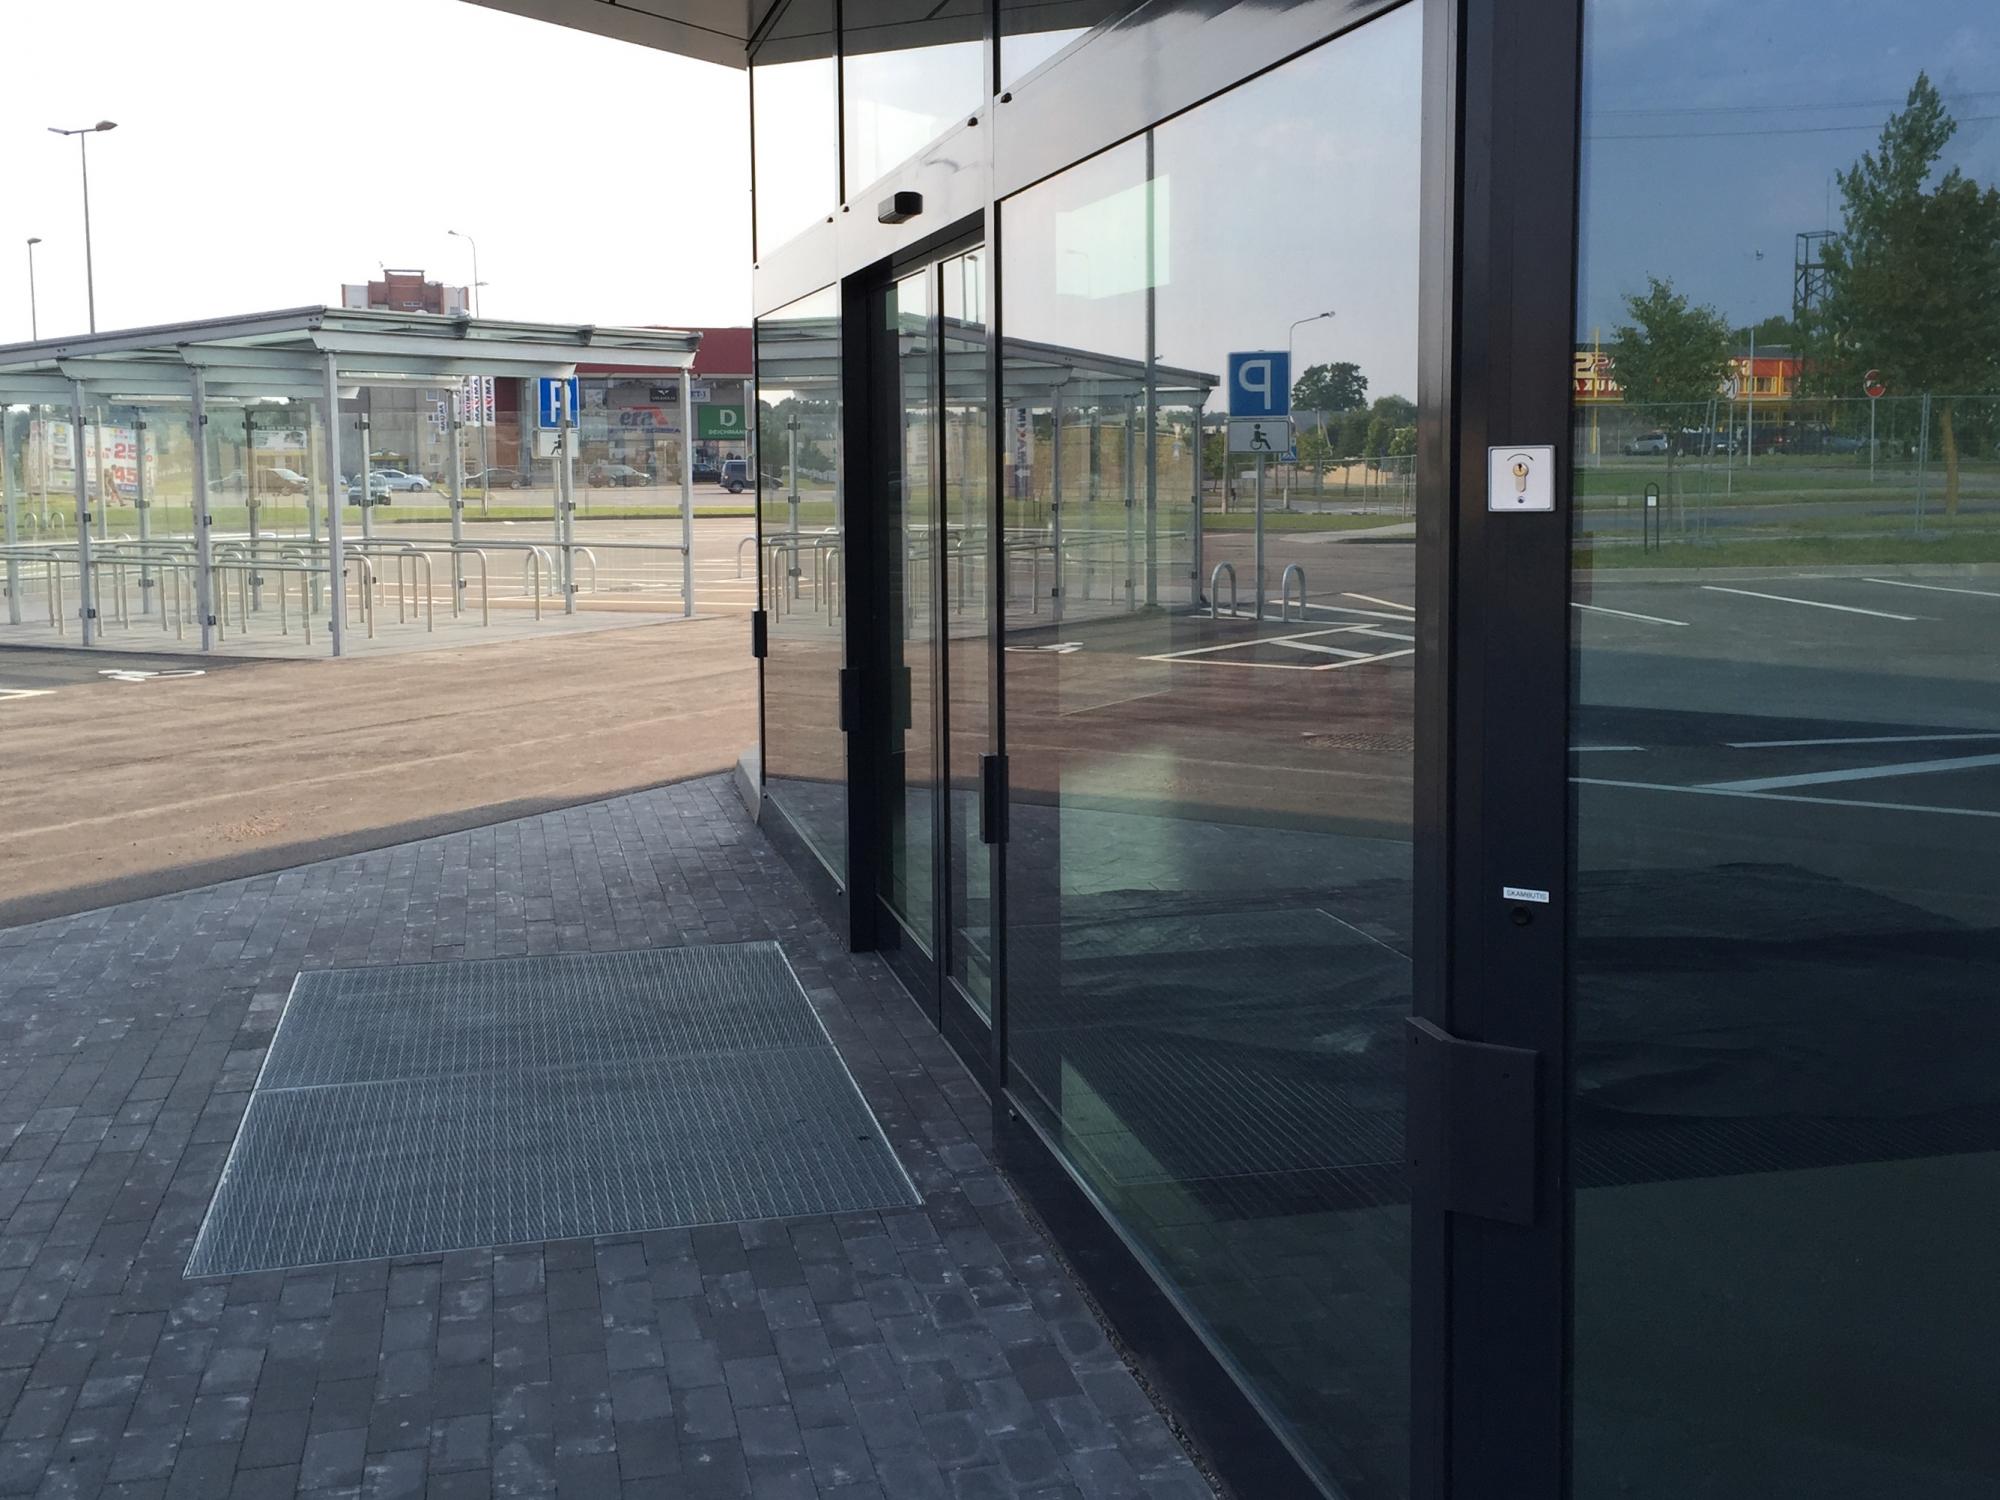 SAPA aluminium facades 4150 SAPA automatic sliding doors in facade. & SAPA Facades 4150 Automatic sliding doors LT | Alvindus.com